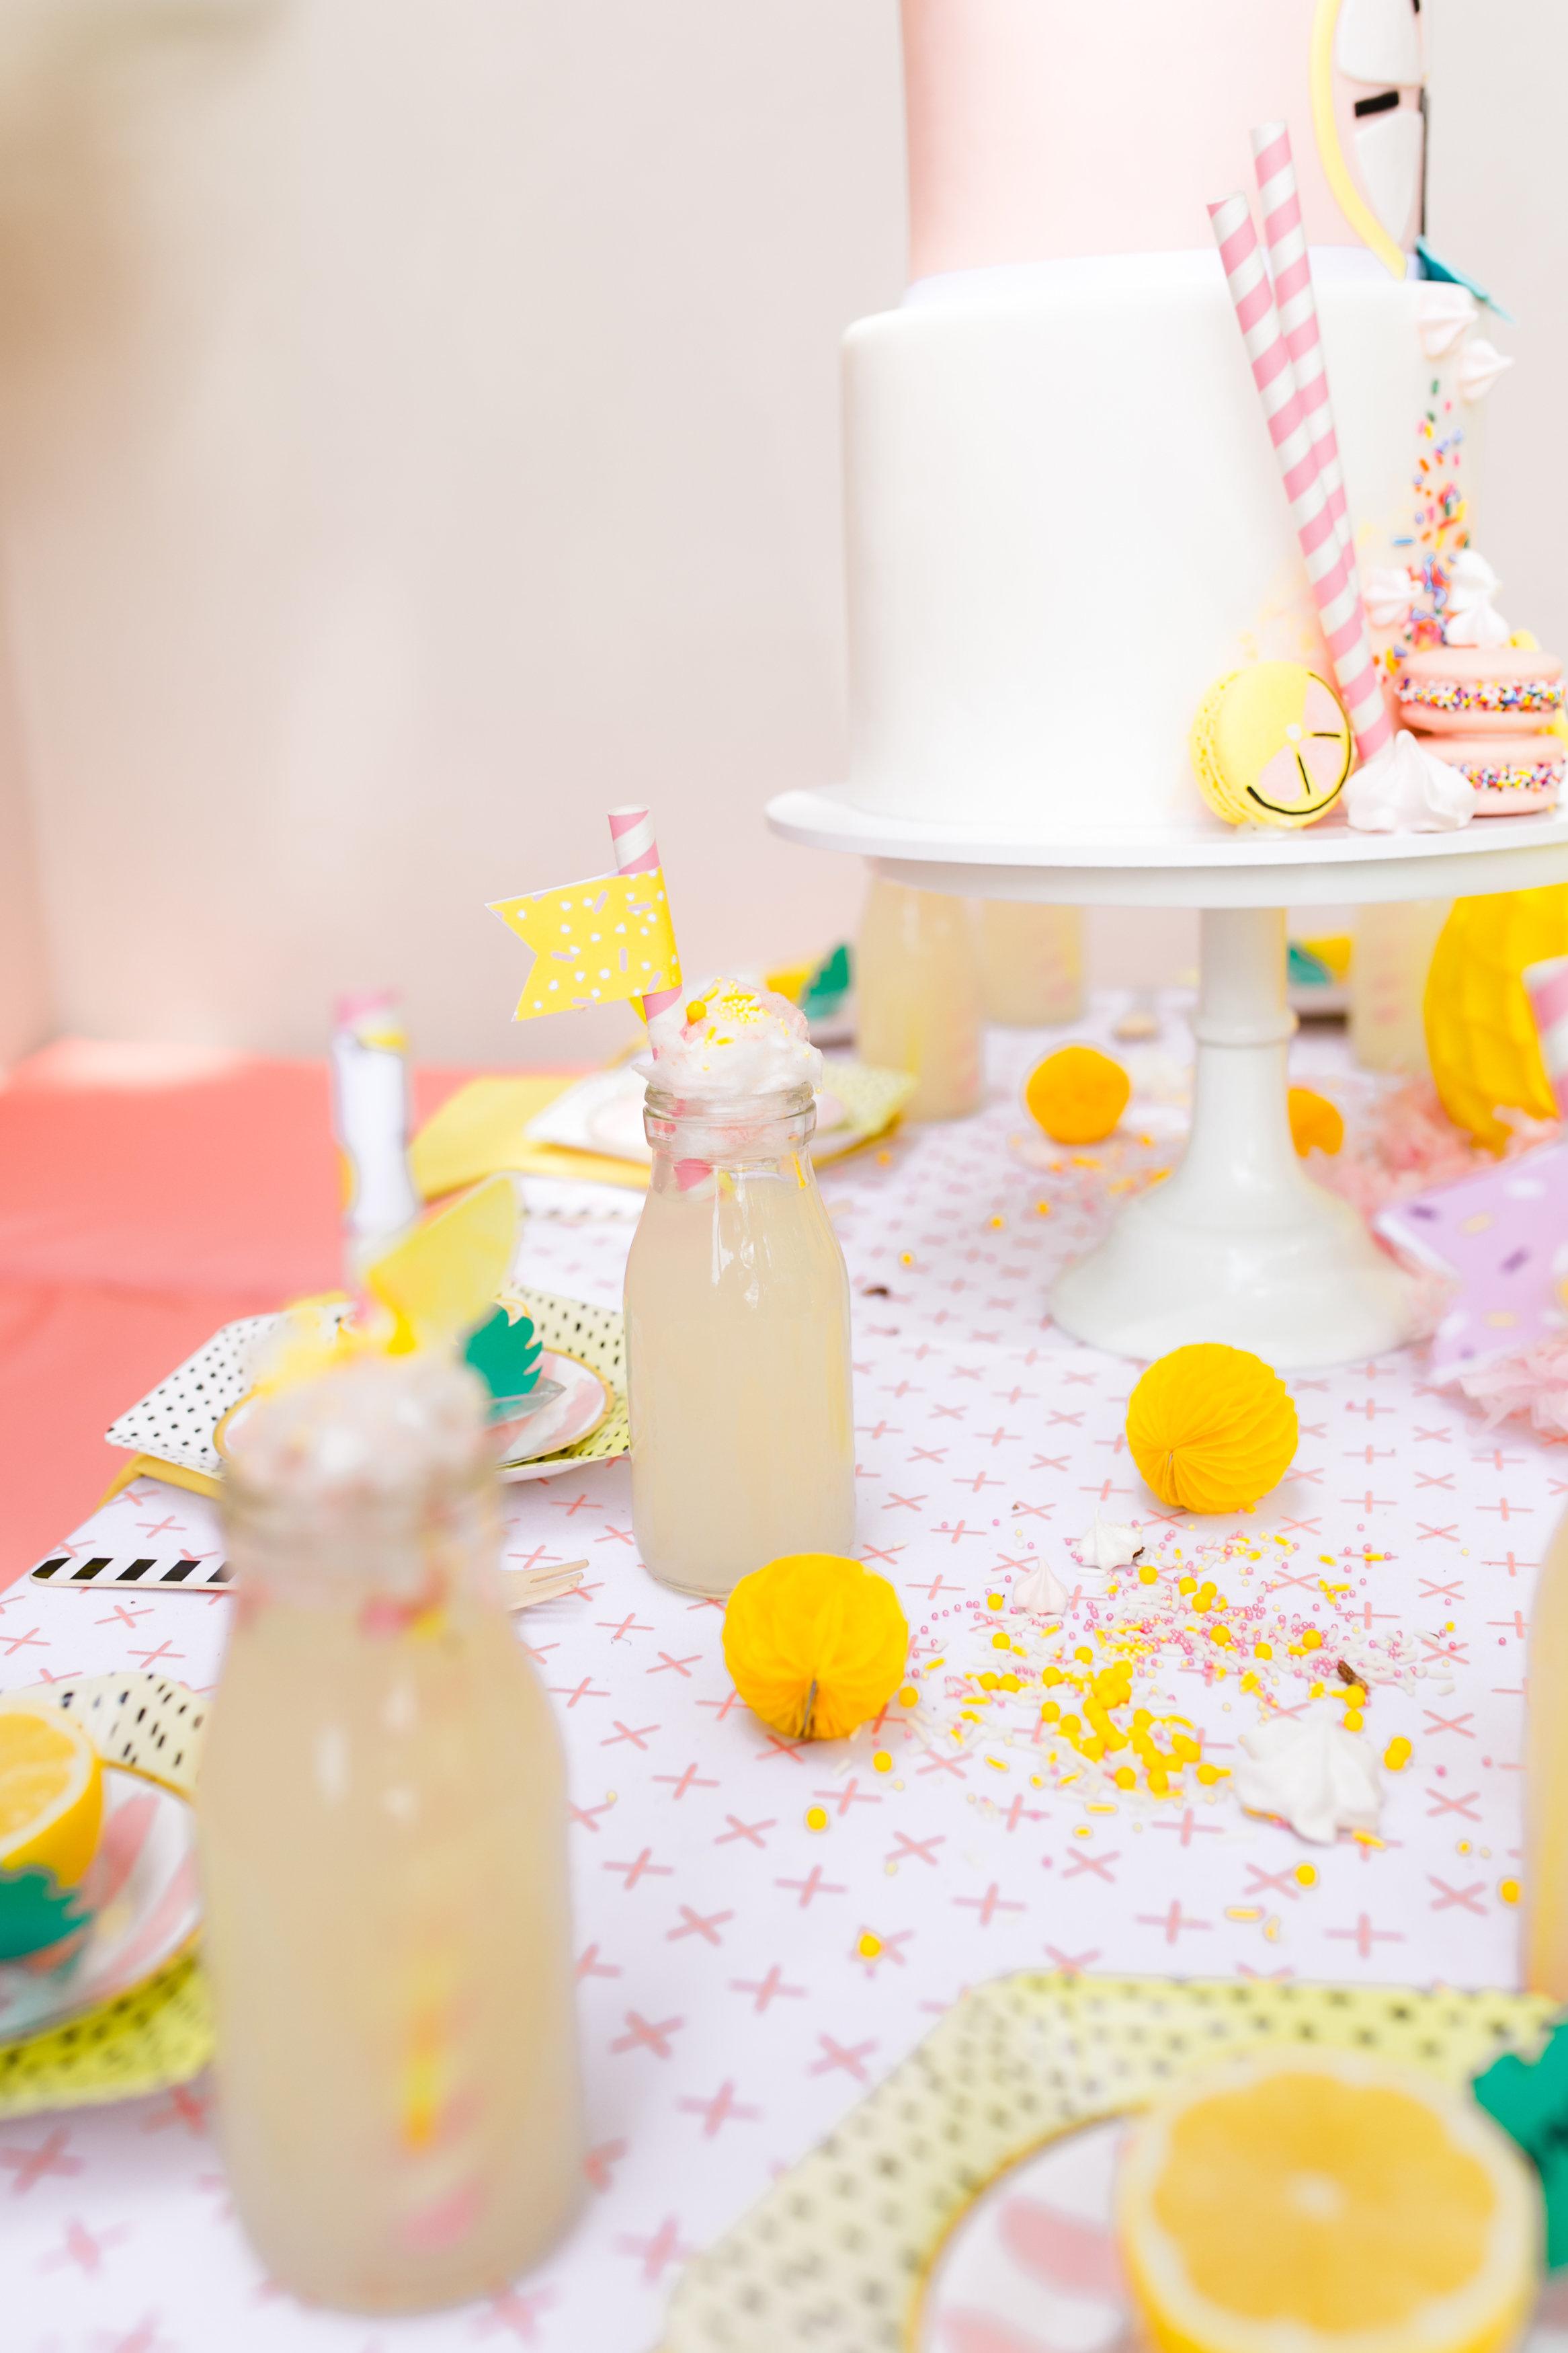 Lemonade kids birthday party - Tabletop Decor and Lemonade Glasses